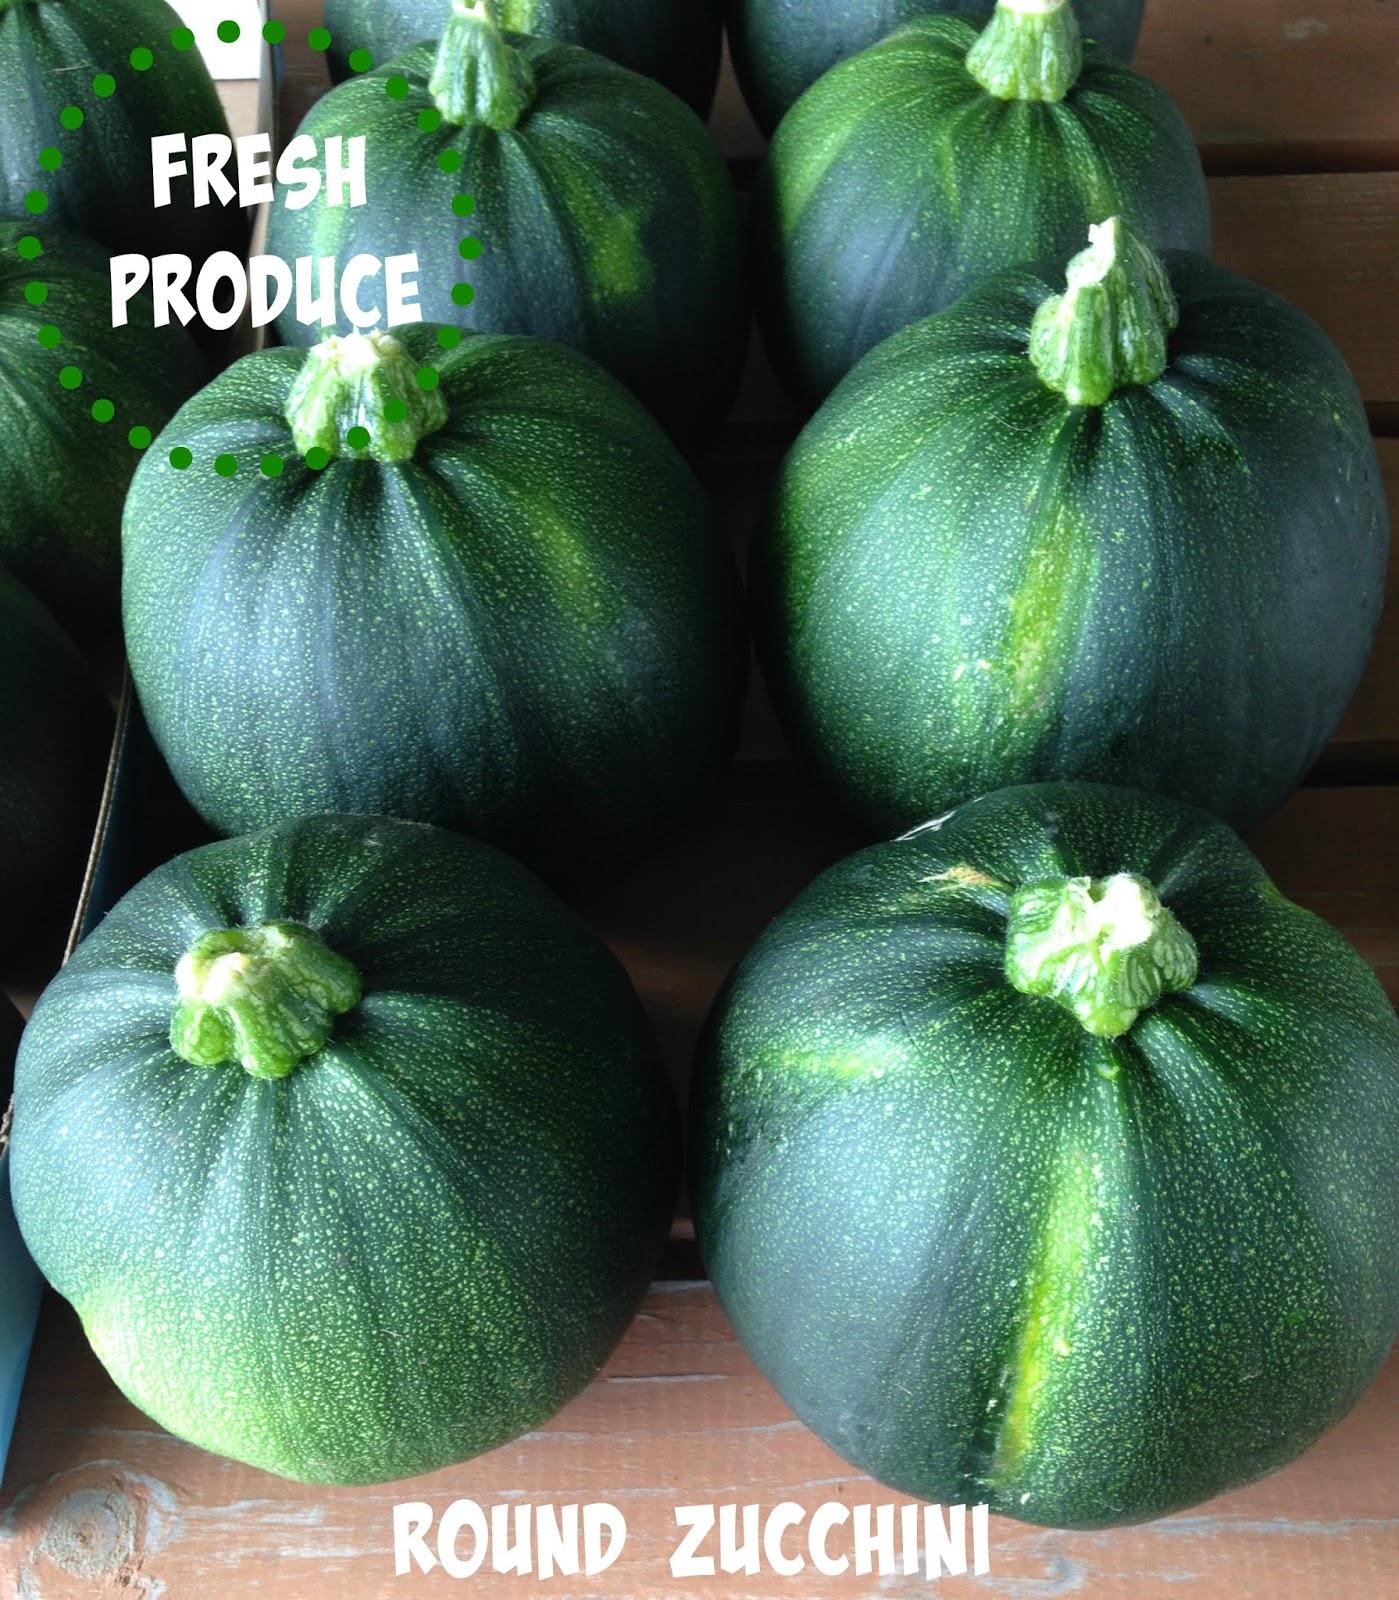 stuffed round zucchini turnips 2 tangerines. Black Bedroom Furniture Sets. Home Design Ideas